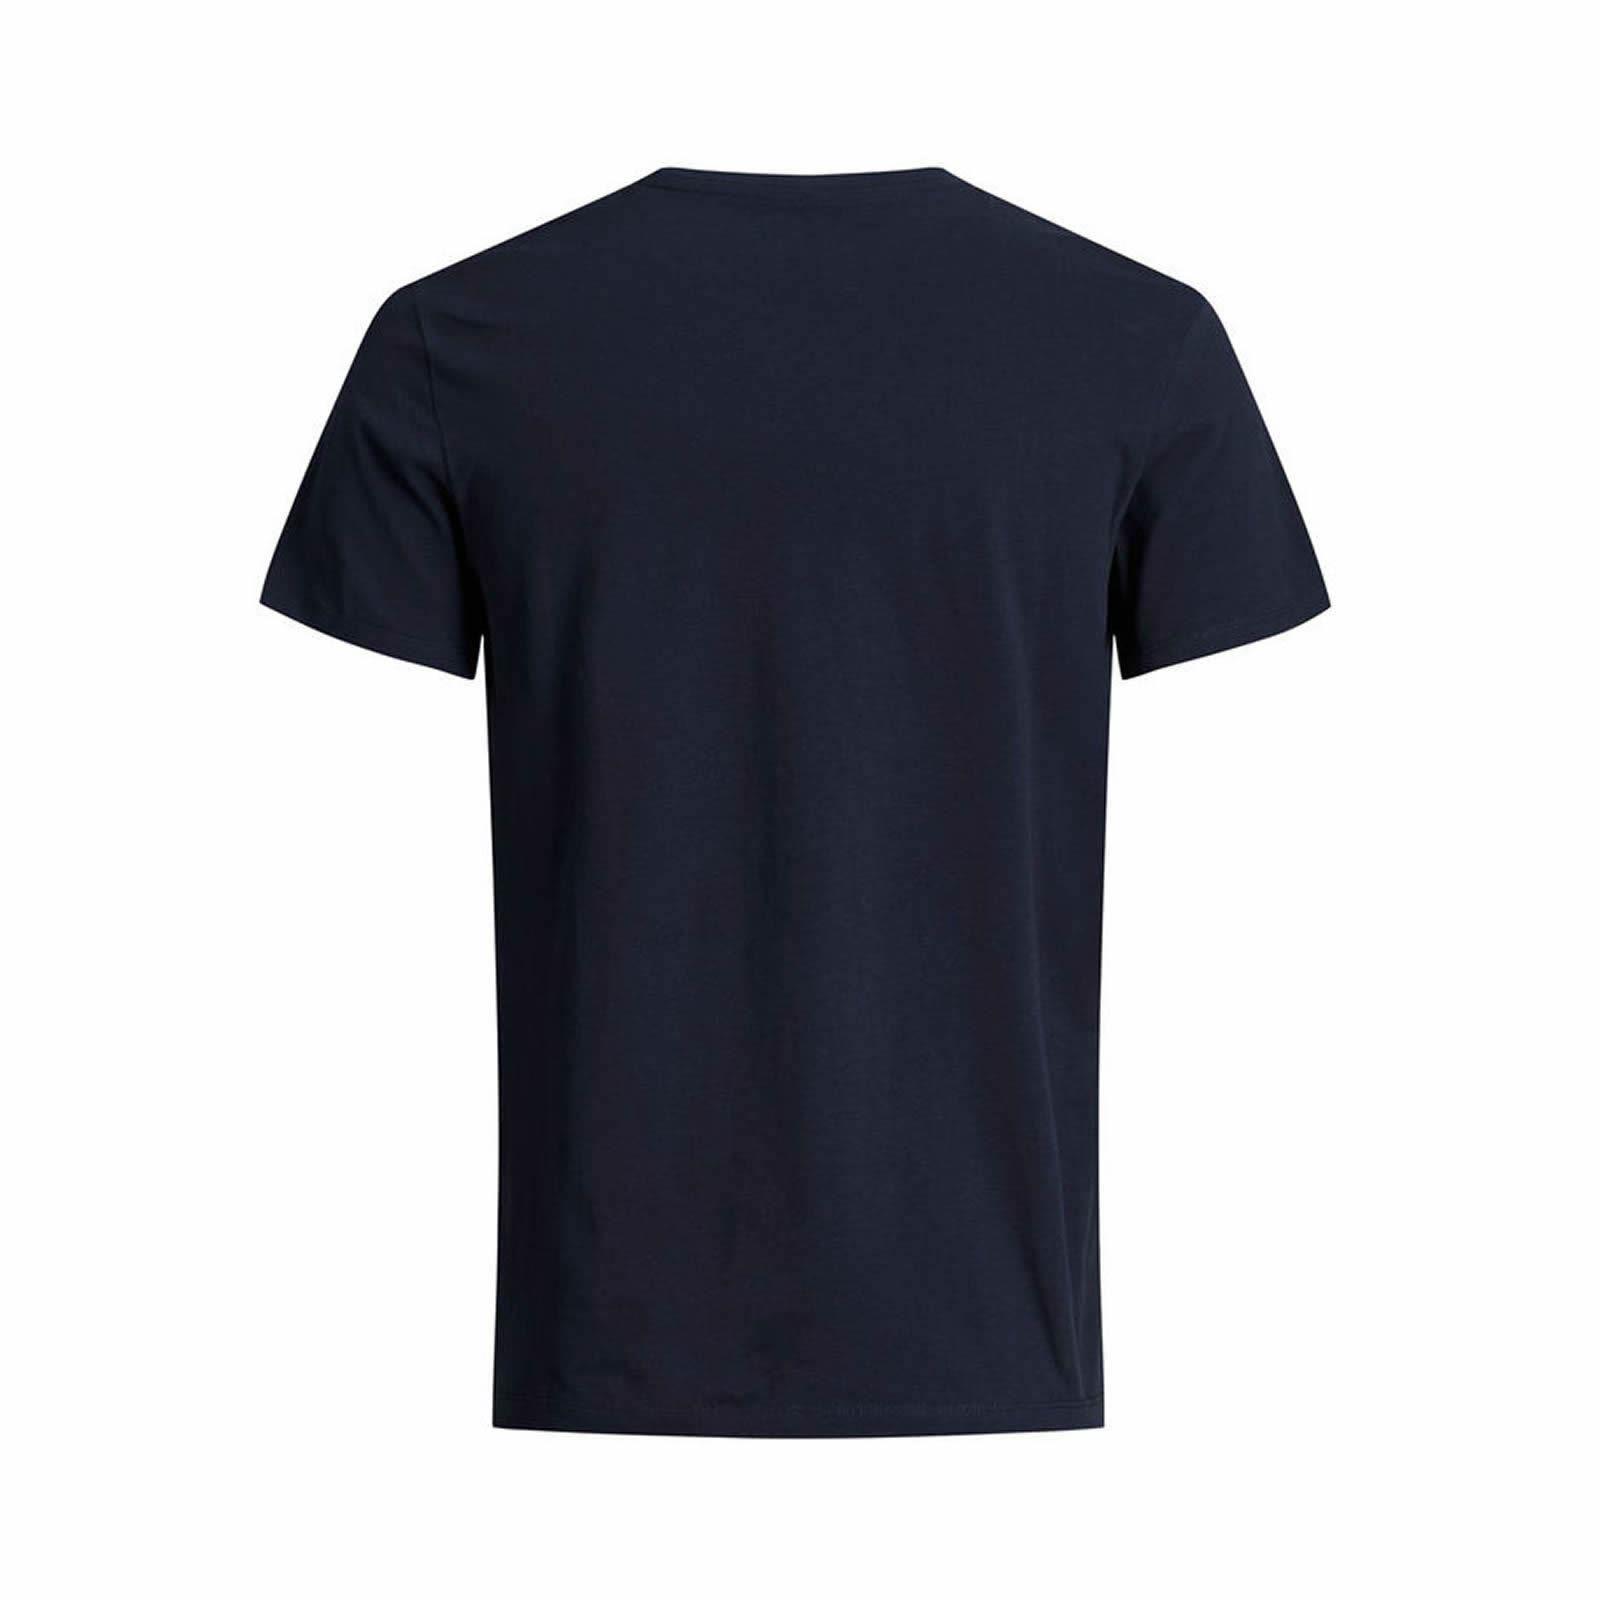 Mens T Shirt JACK /& JONES New Light Crew Neck Short Sleeve Plain Tee